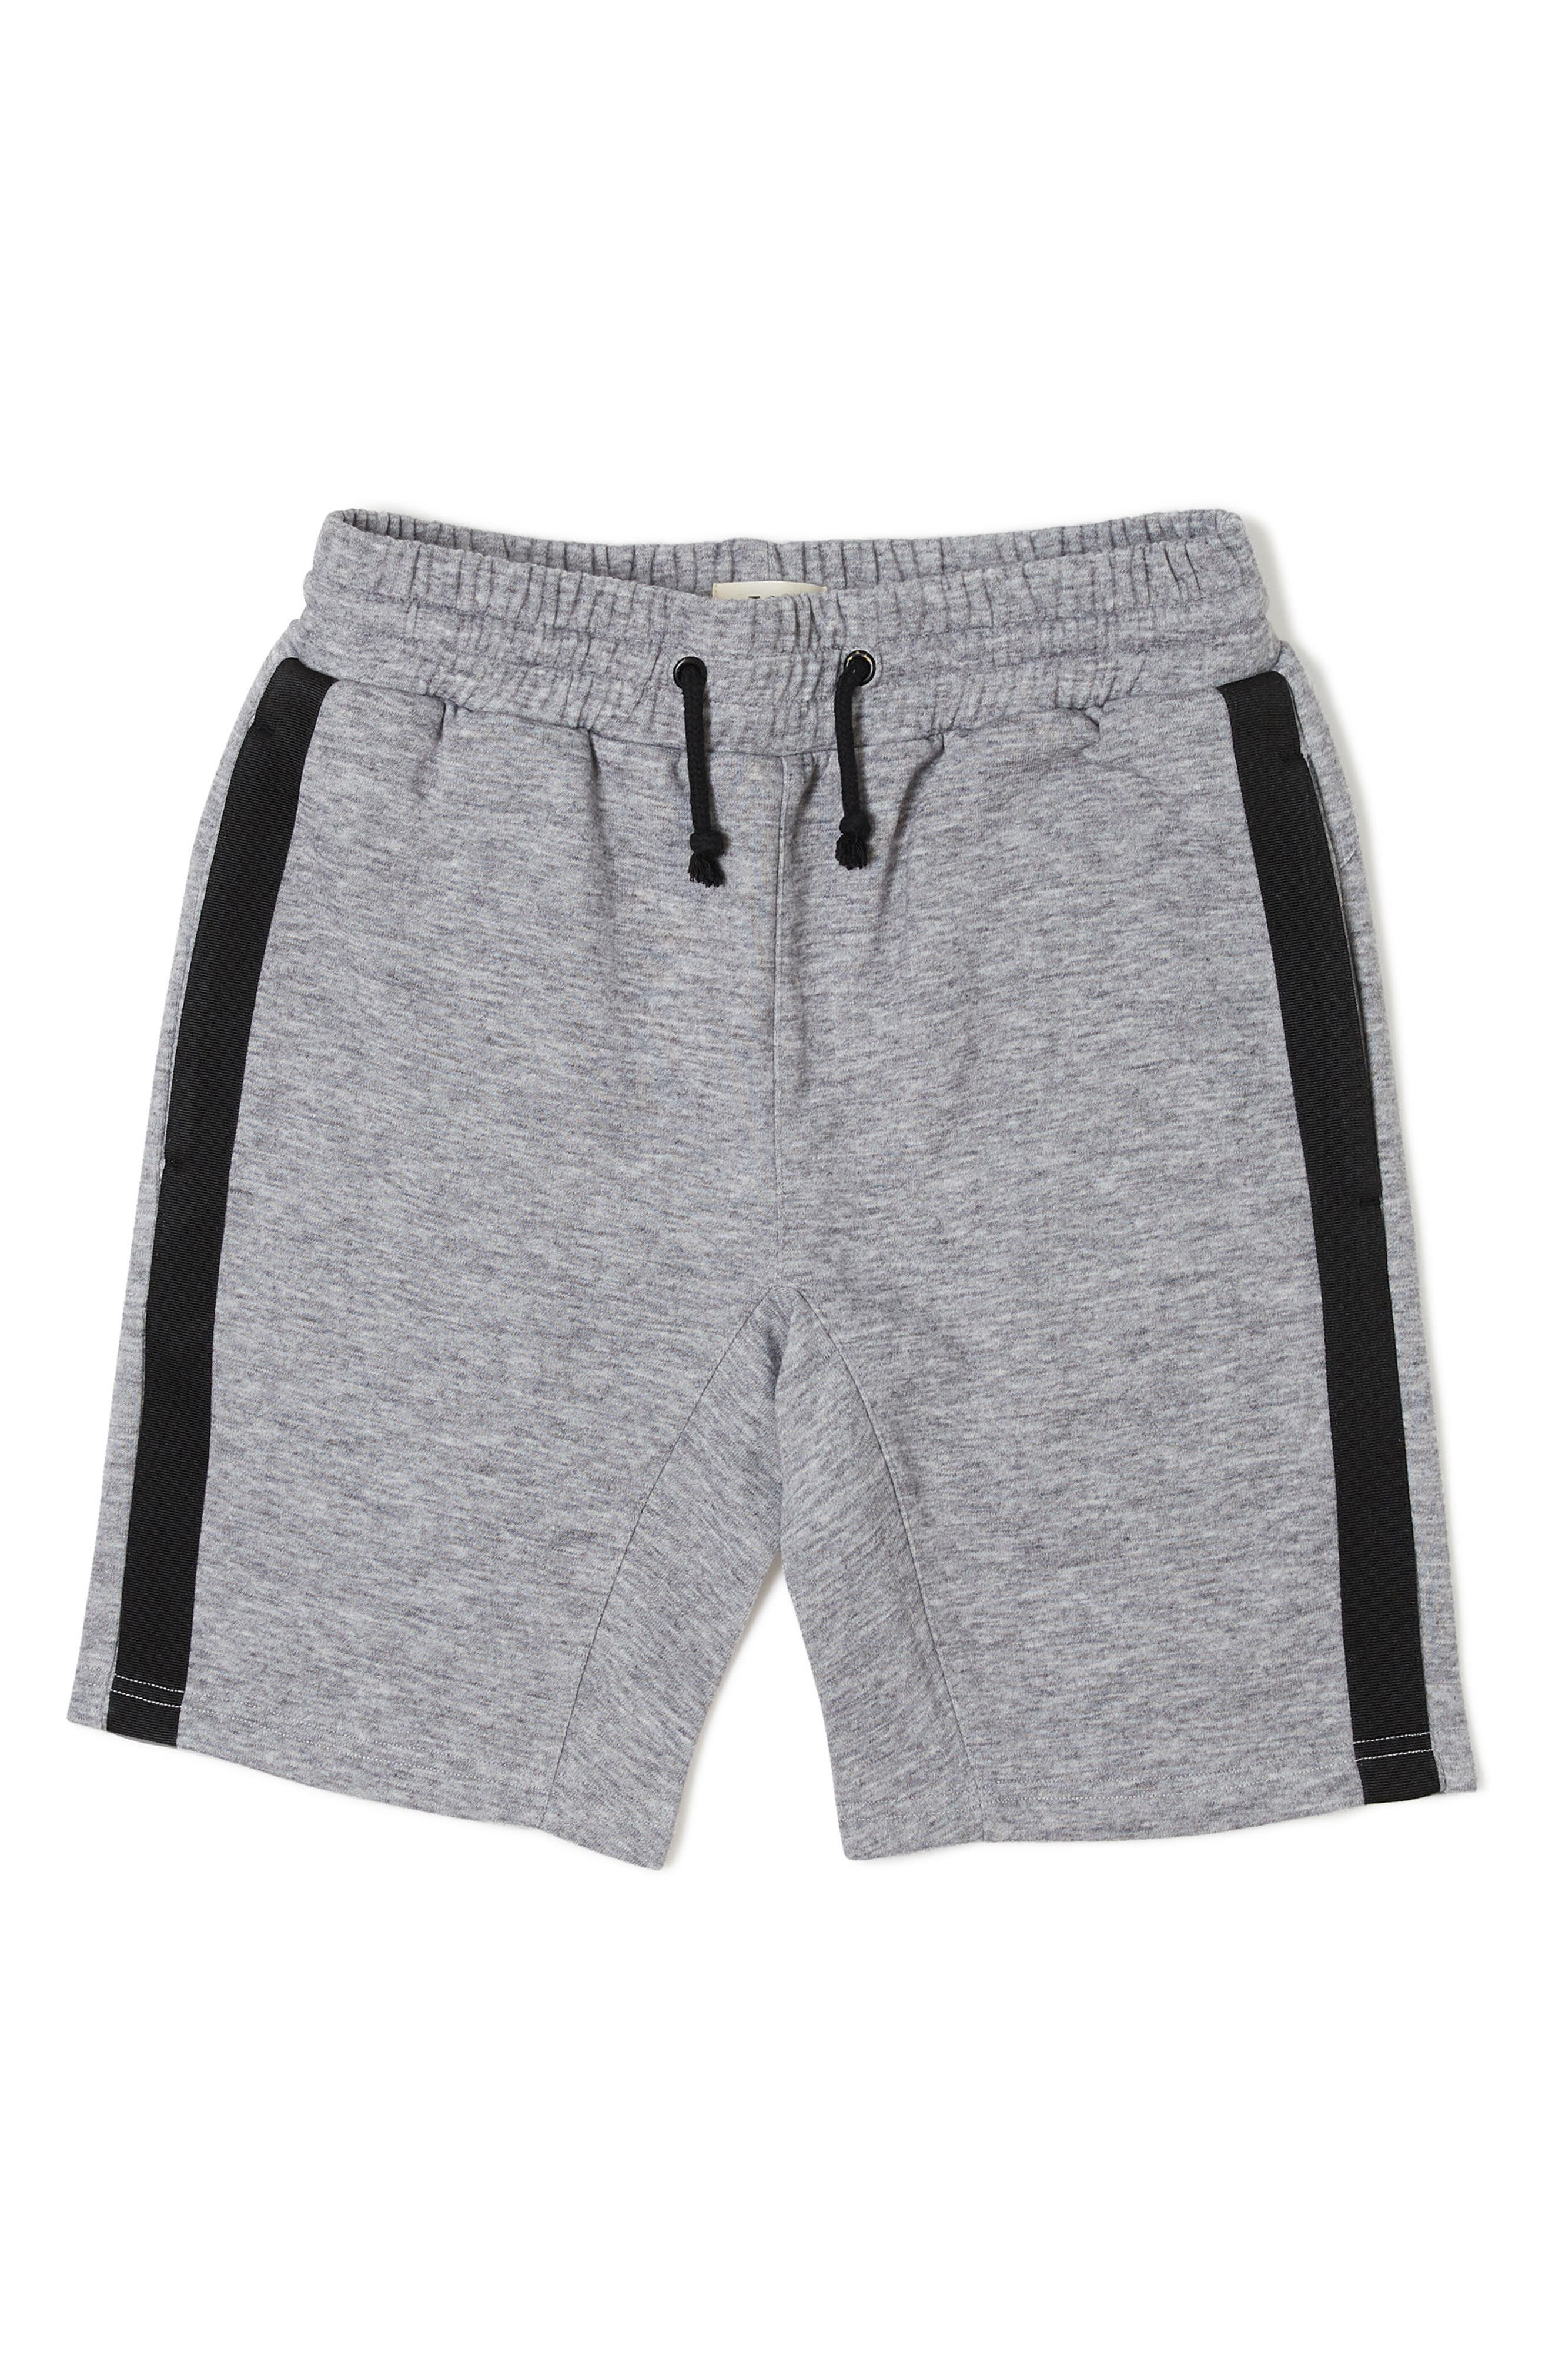 Rhett Knit Shorts,                         Main,                         color, HEATHER GREY